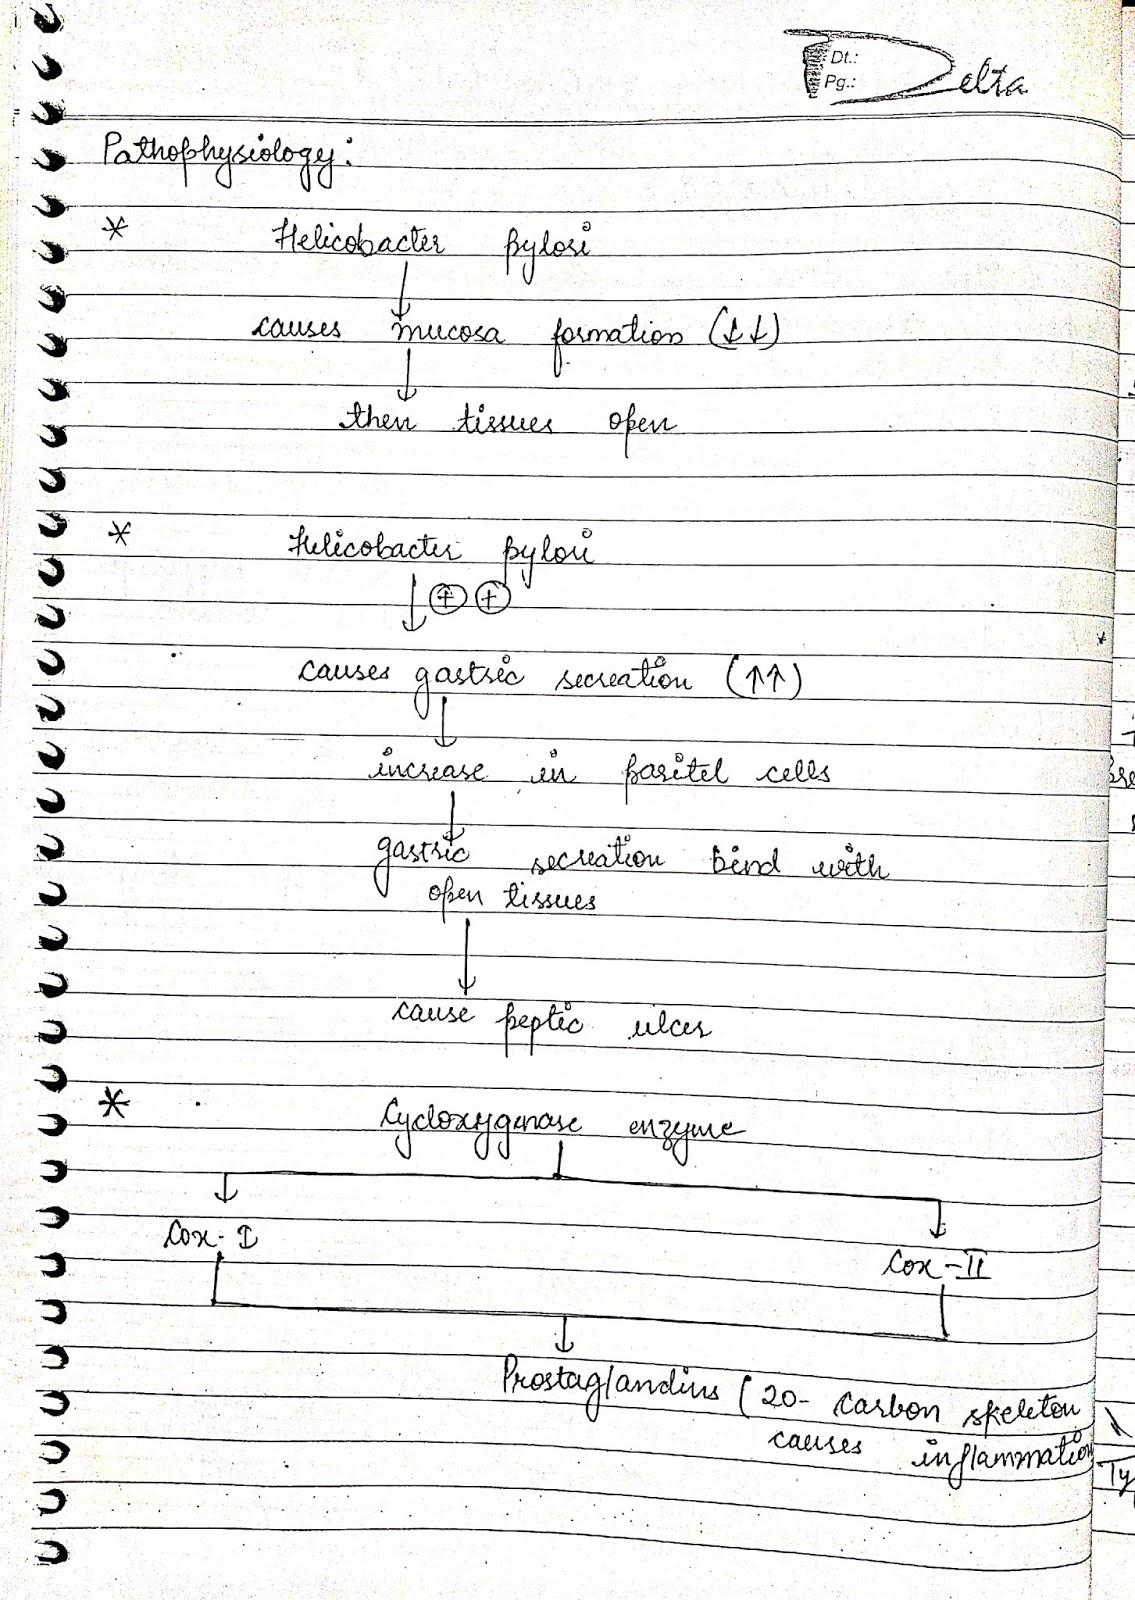 pathophysiology - GIT disorder PEPTIC ULCER